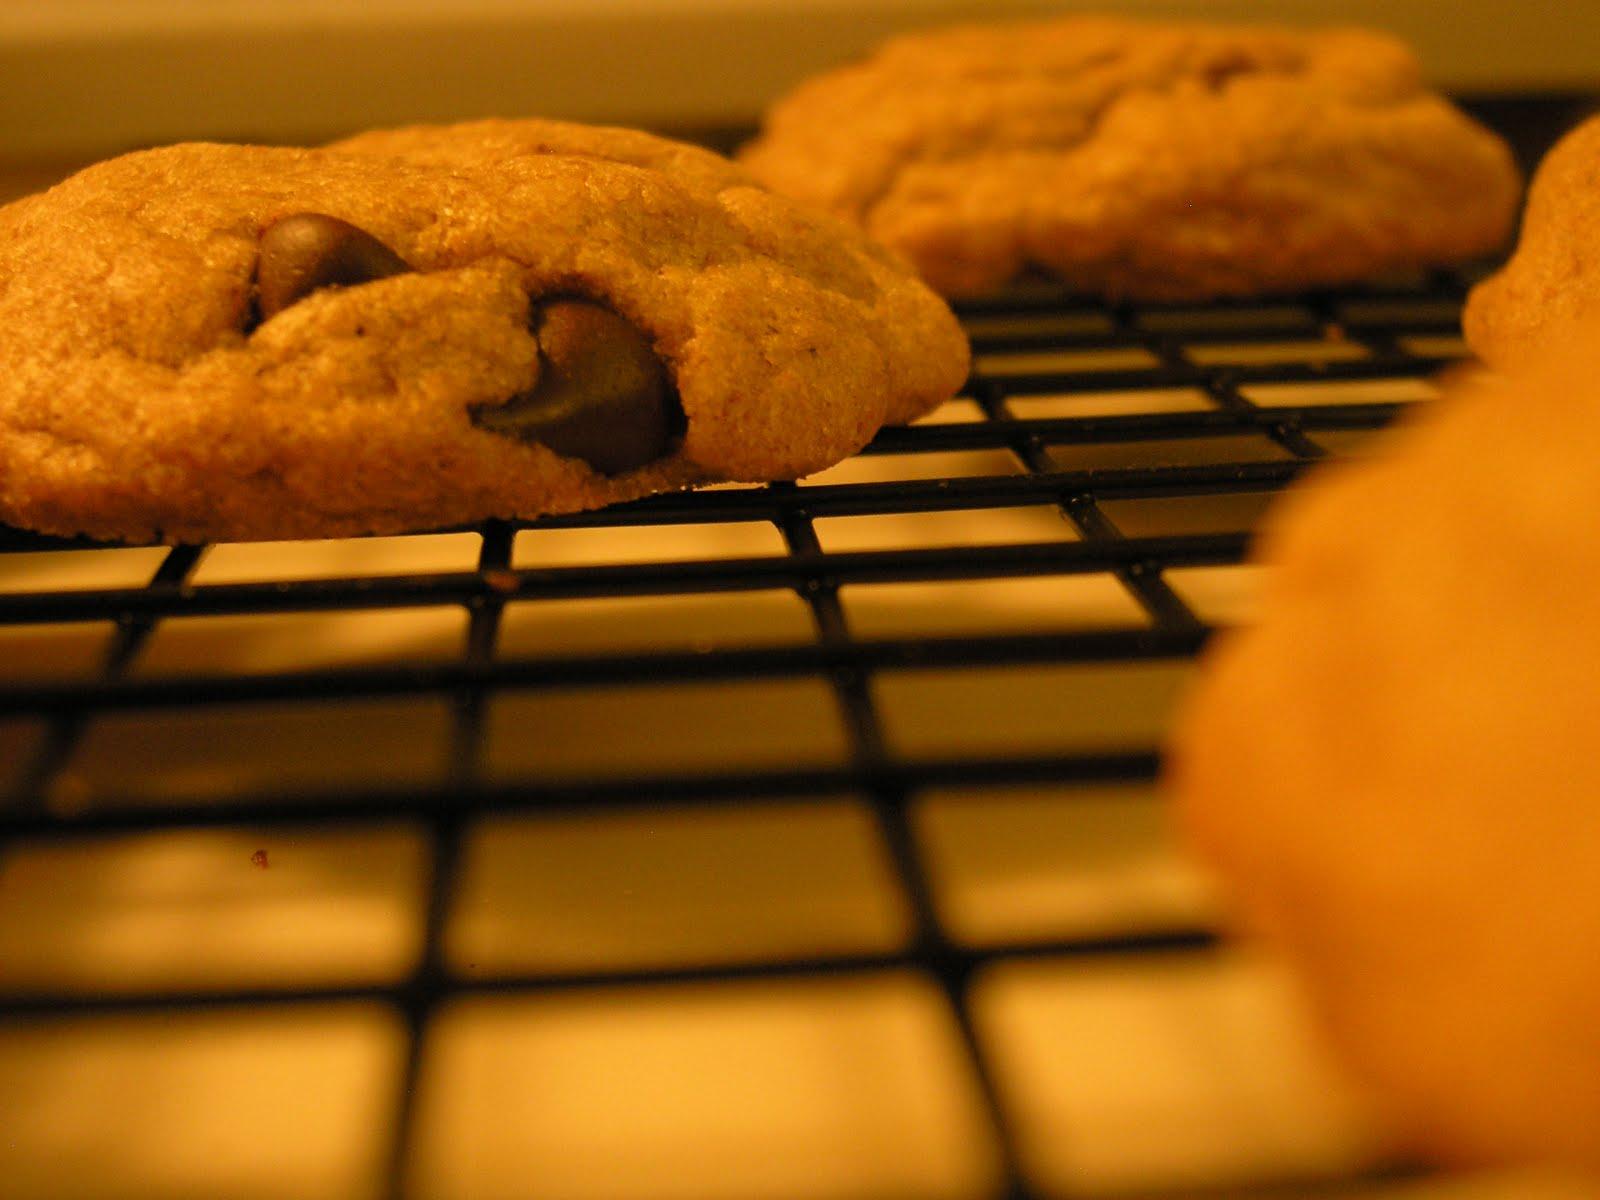 La panadera desnuda smitten kitchen 39 s crispy chewy for Smitten kitchen chocolate chip cookies